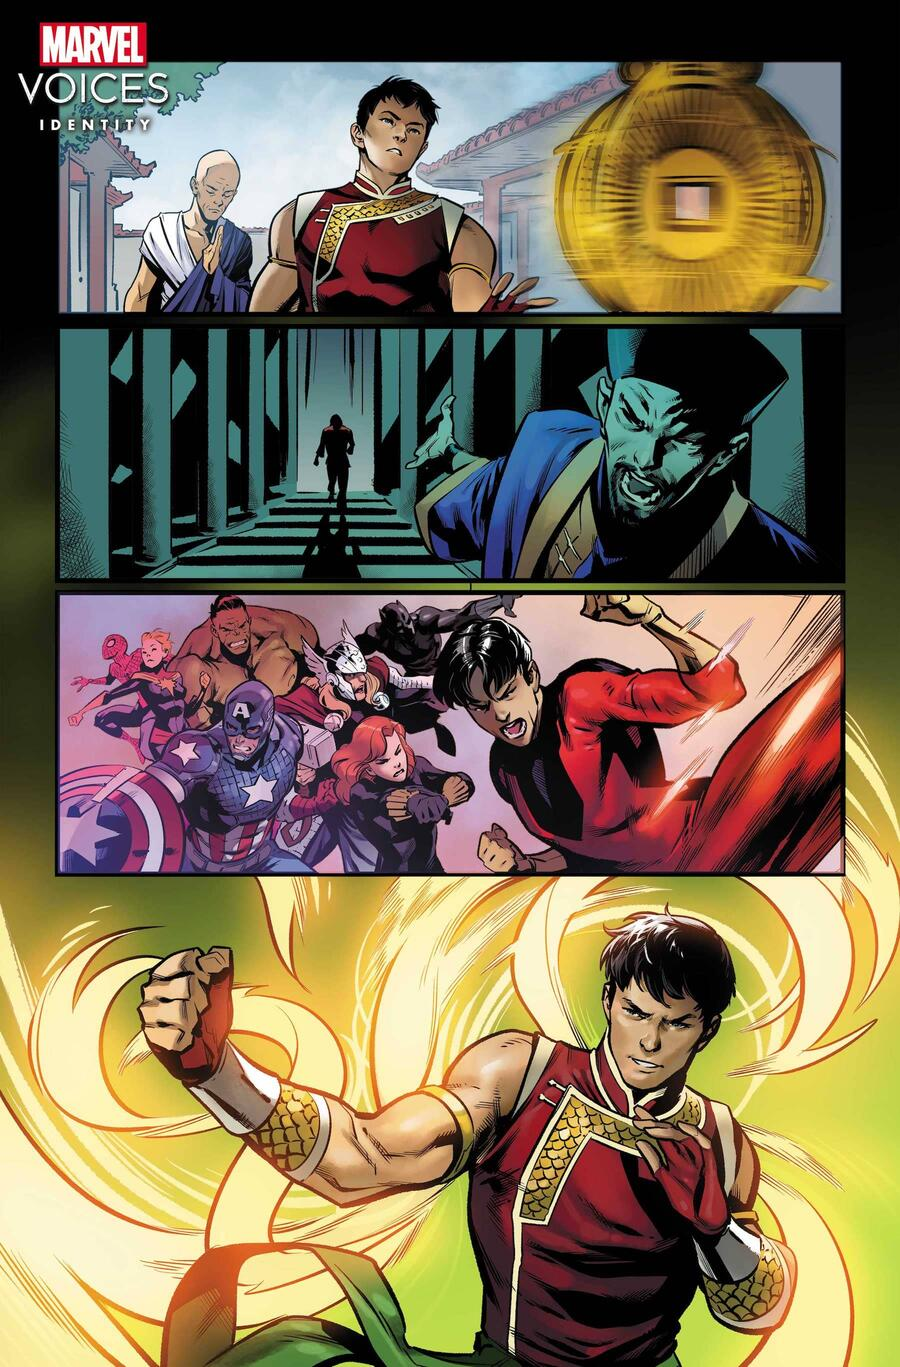 Shang-Chi Writer: Gene Luen Yang Artist: Marcus To Colorist: Sunny Gho